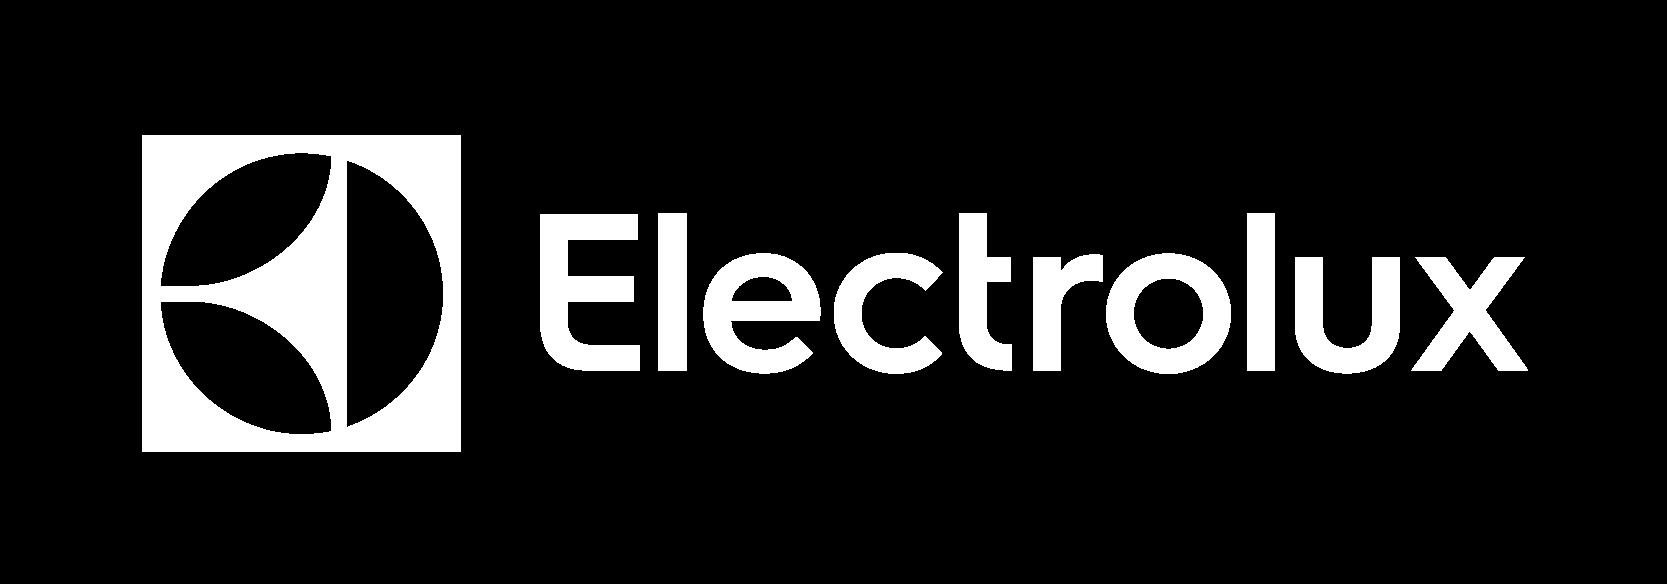 Electrolux_White-01